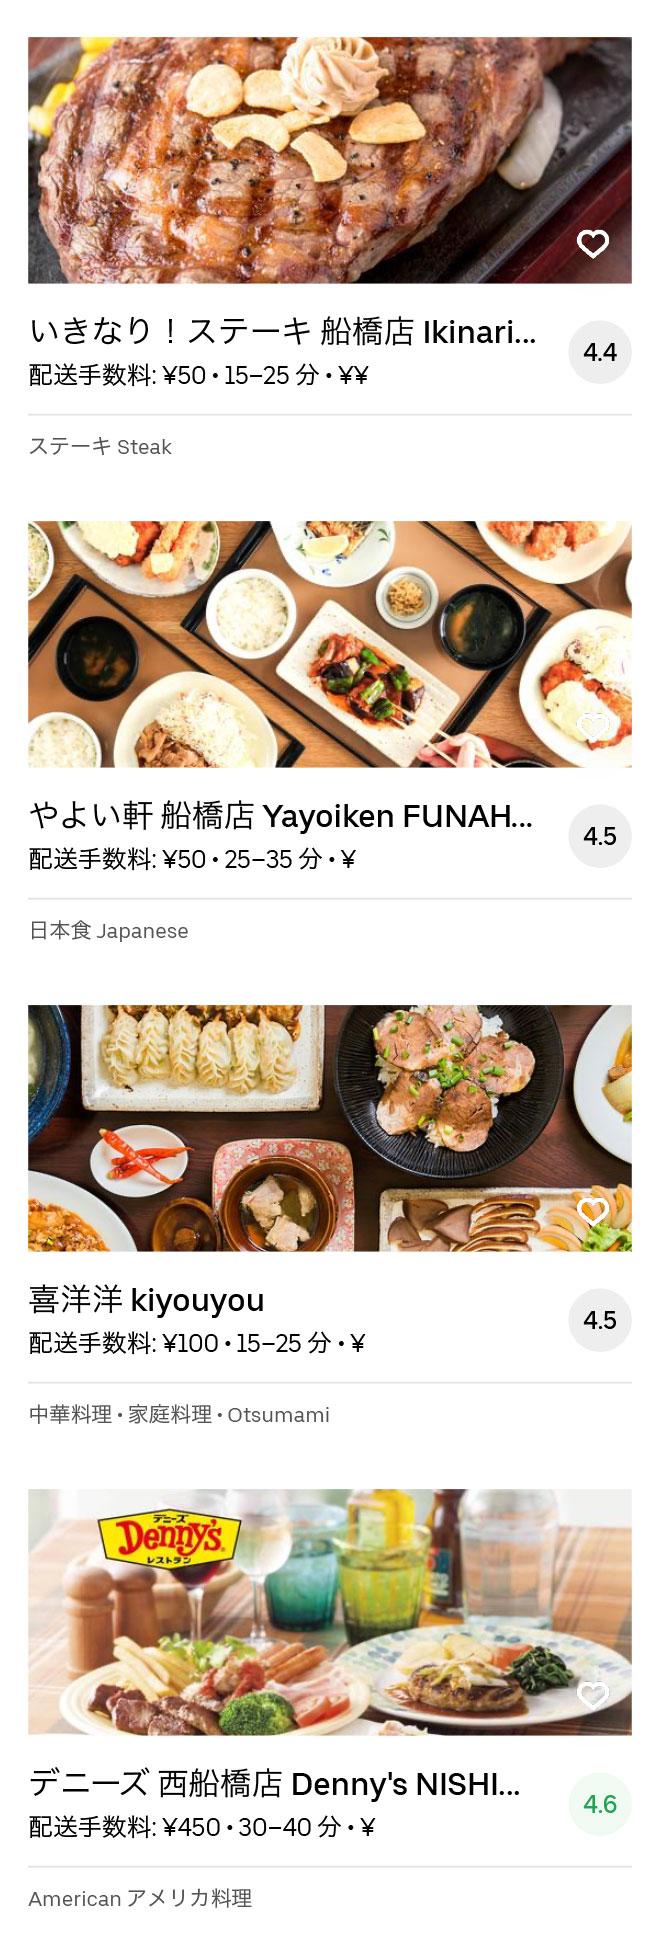 Funabashi menu 2004 08